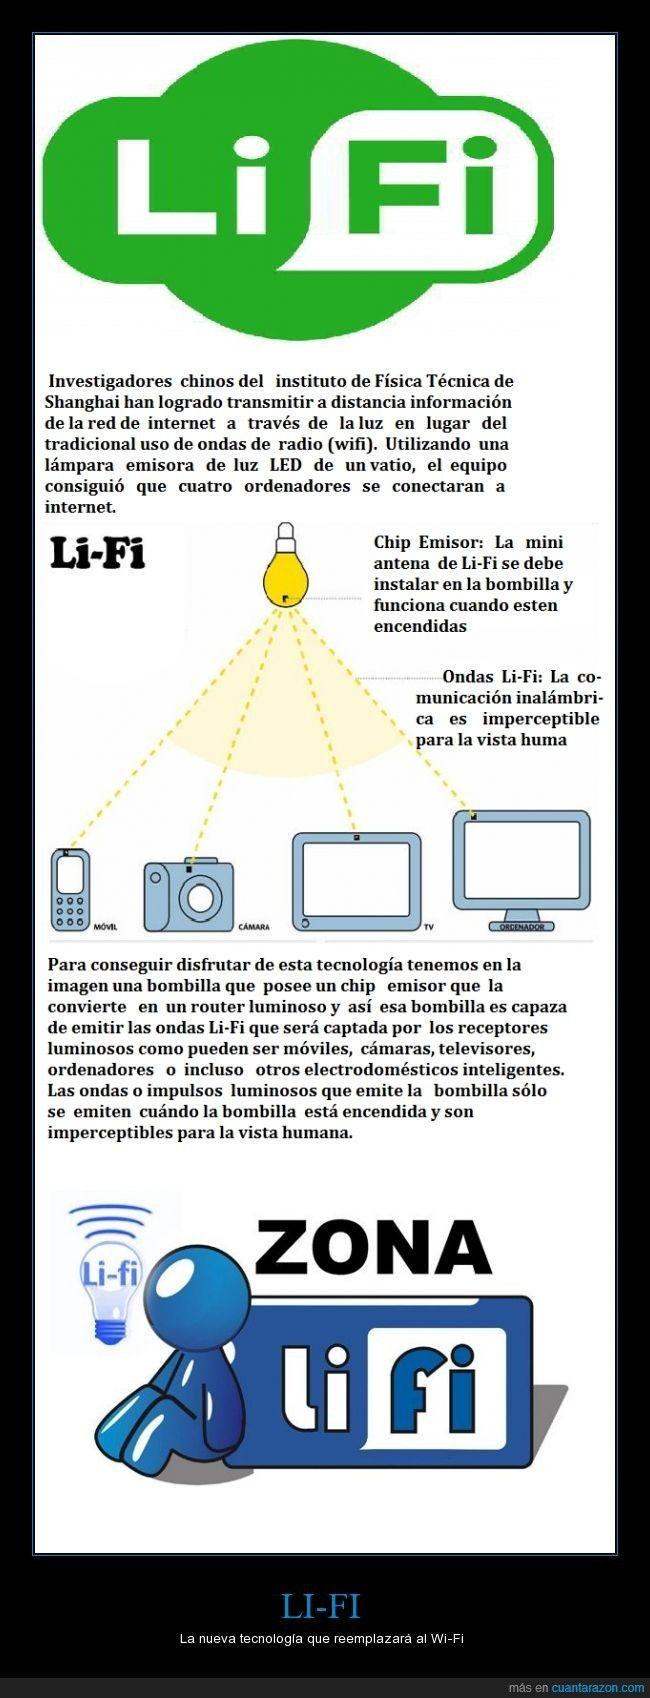 163 Best Electronica Y Pinouts Images On Pinterest Electronics Lm386 As Multipurpose Radio Circuit Diagram Audiocircuit Sabes Qu Es La Tecnologa Li Fi Matar Al Wi